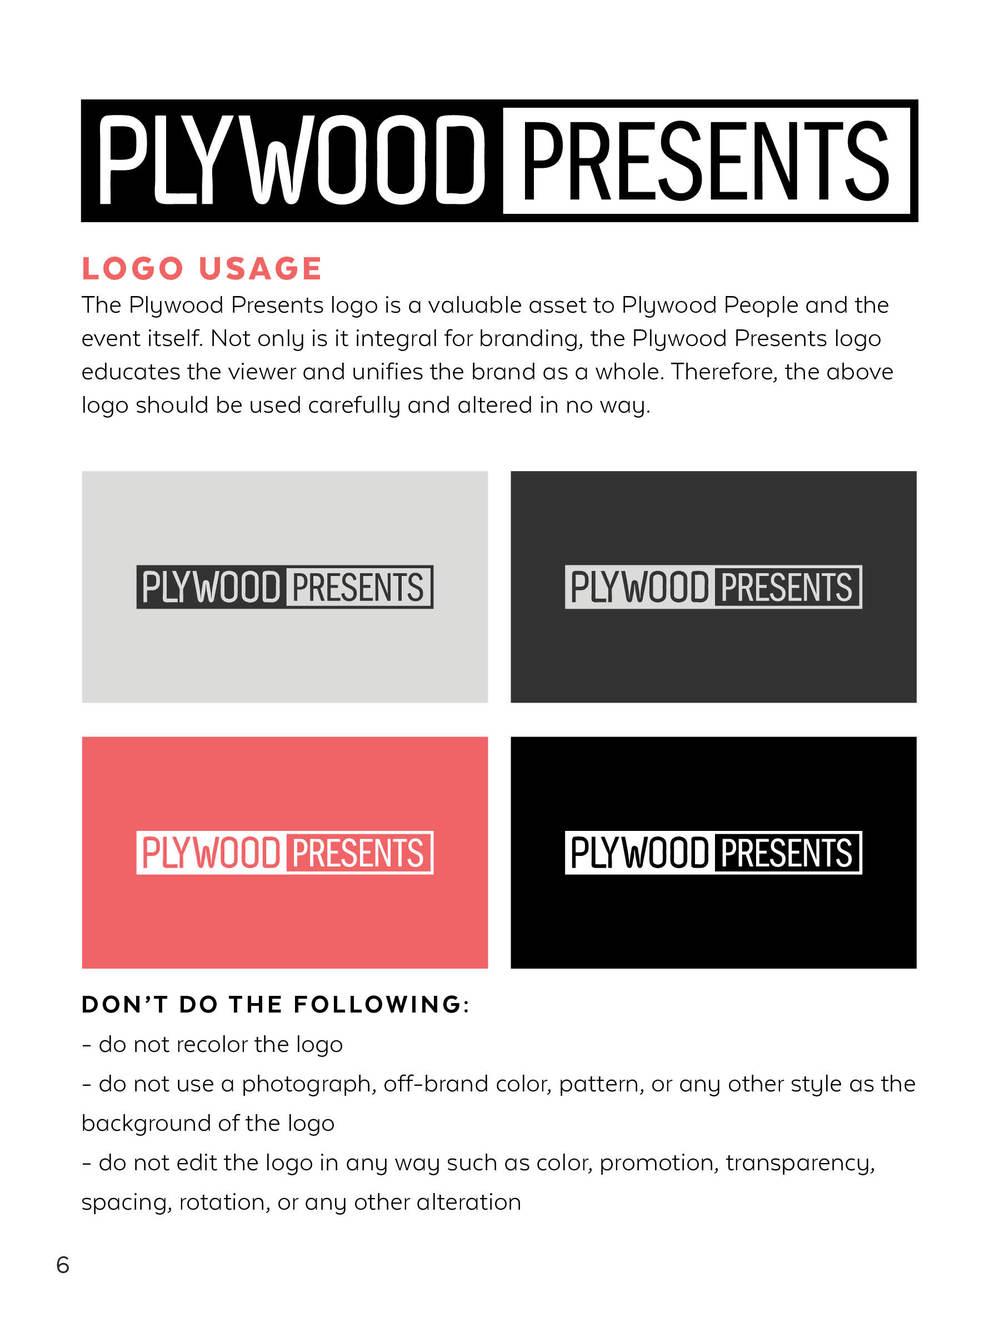 plywoodpresents2015_designlanguage5.jpg